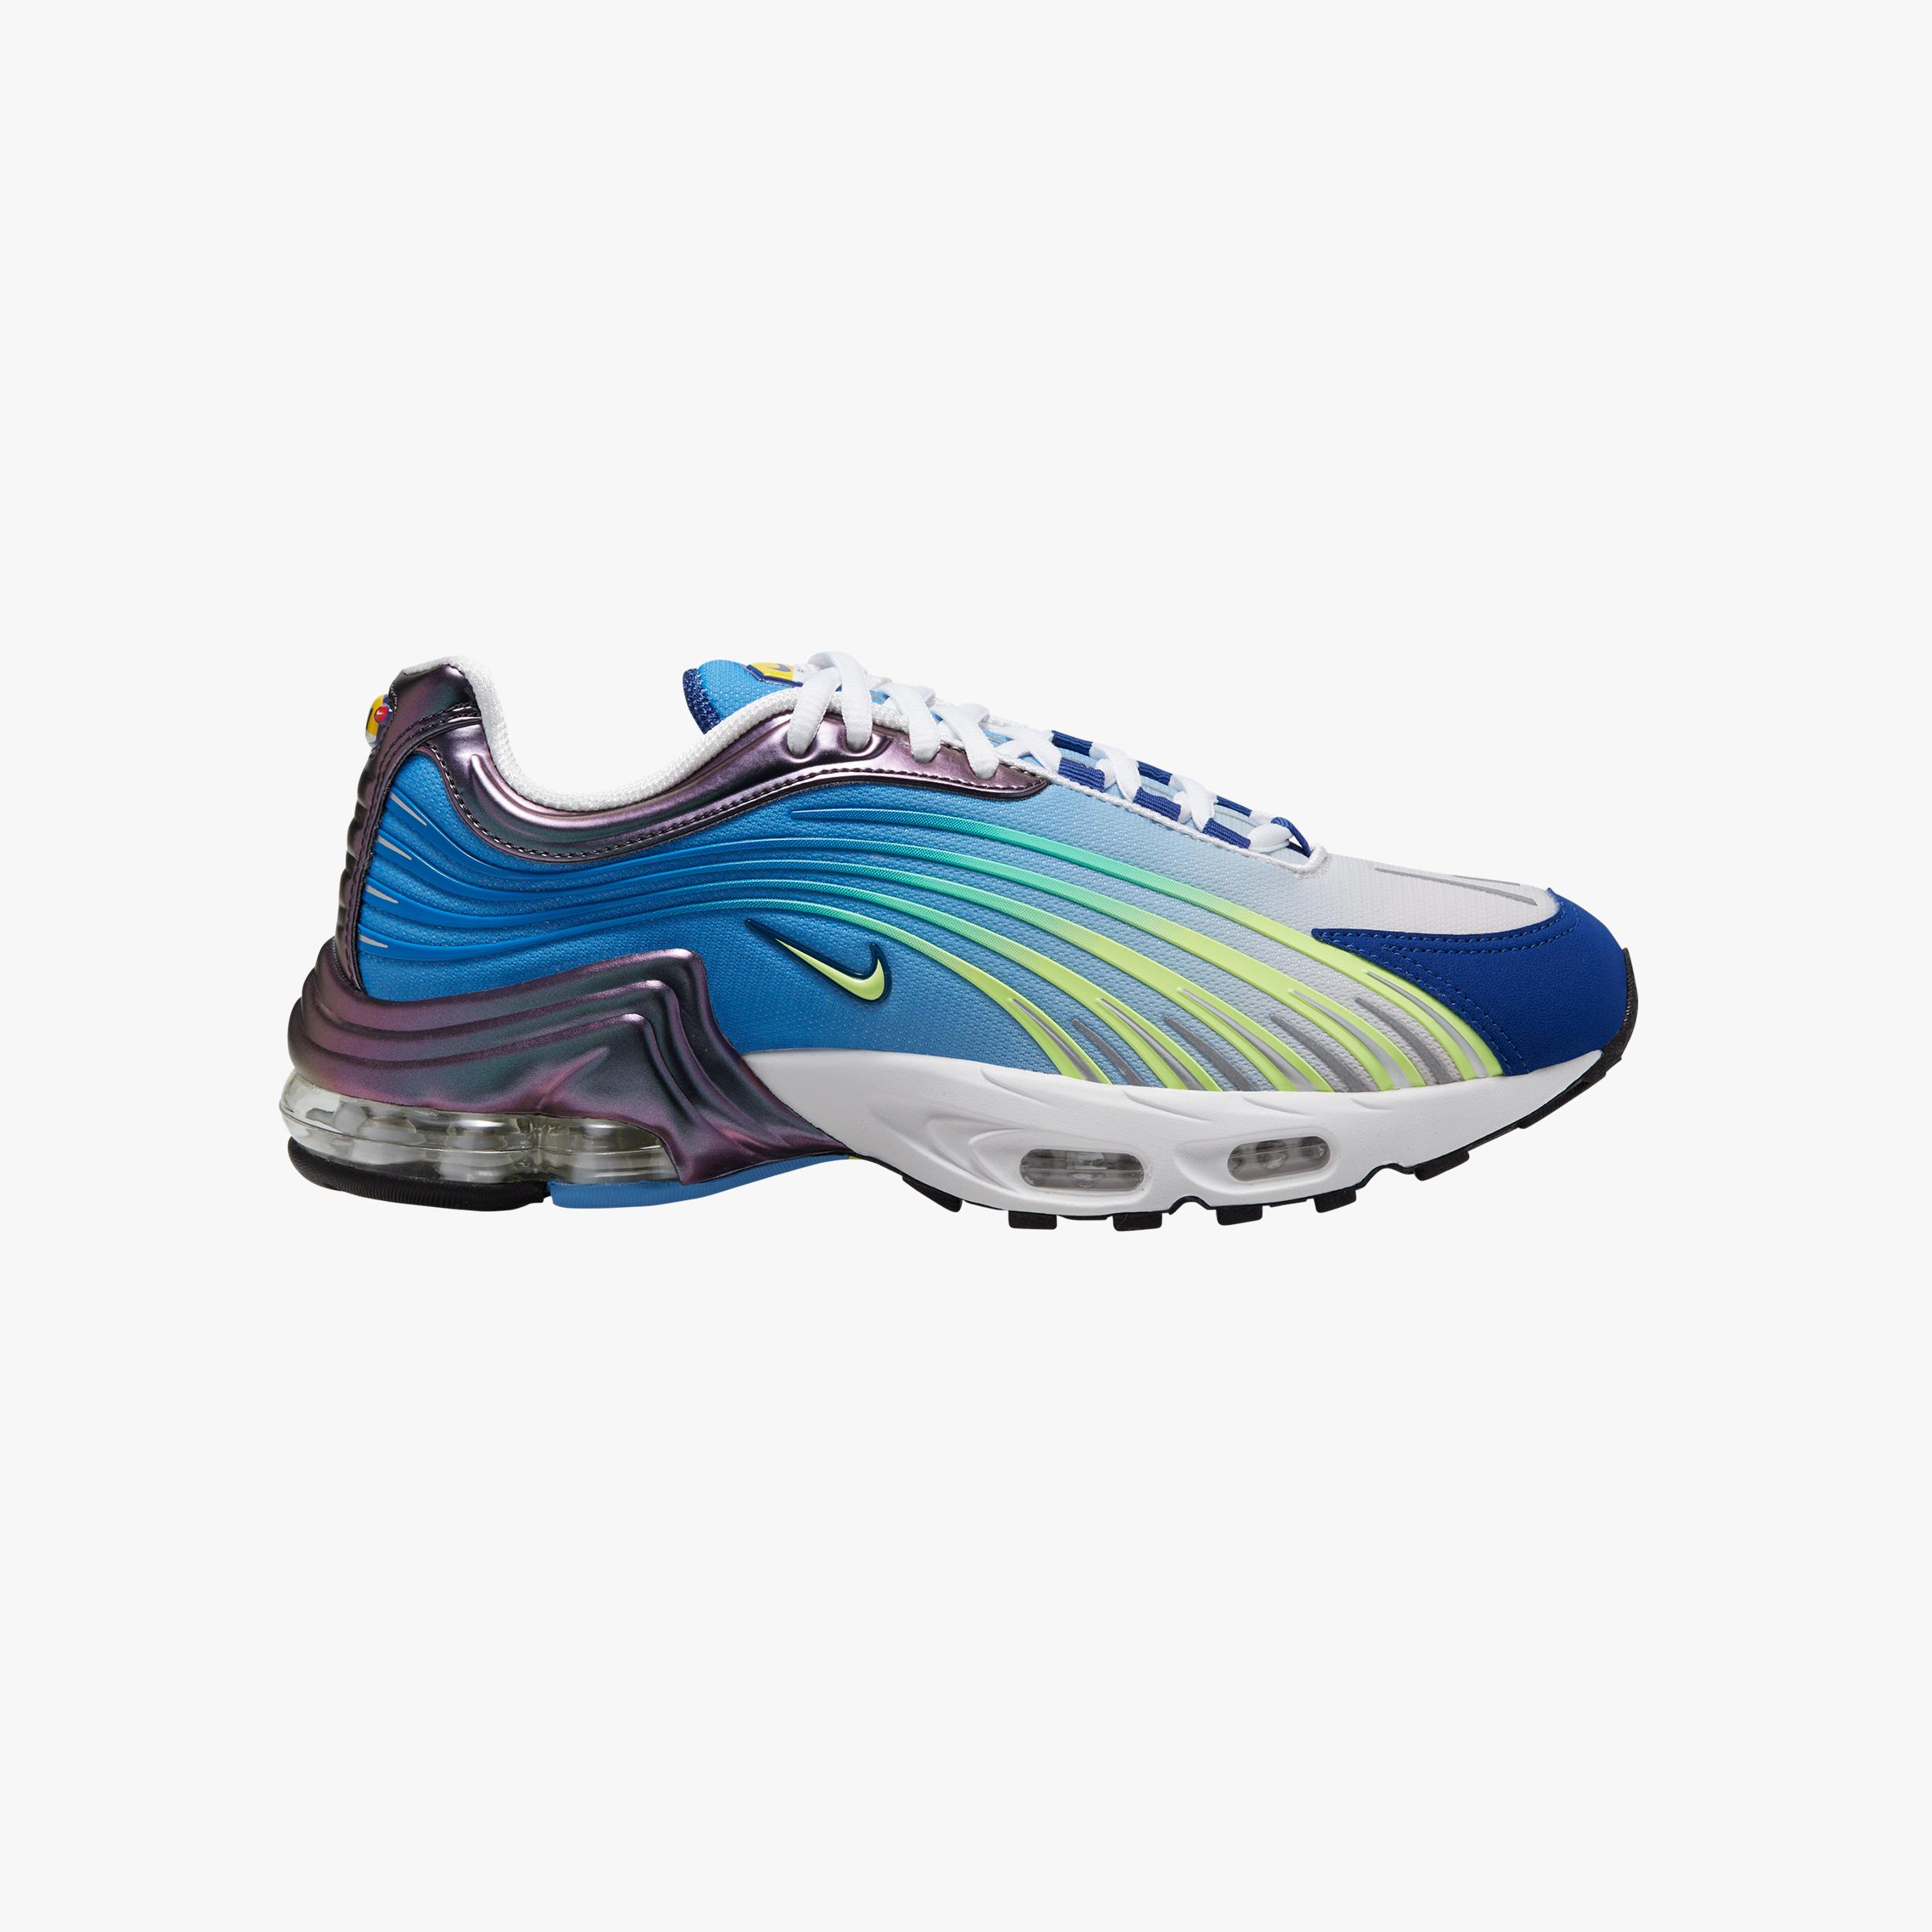 Nike Air Max Plus 2 - Cq7754-400 - SNS | sneakers & streetwear ...